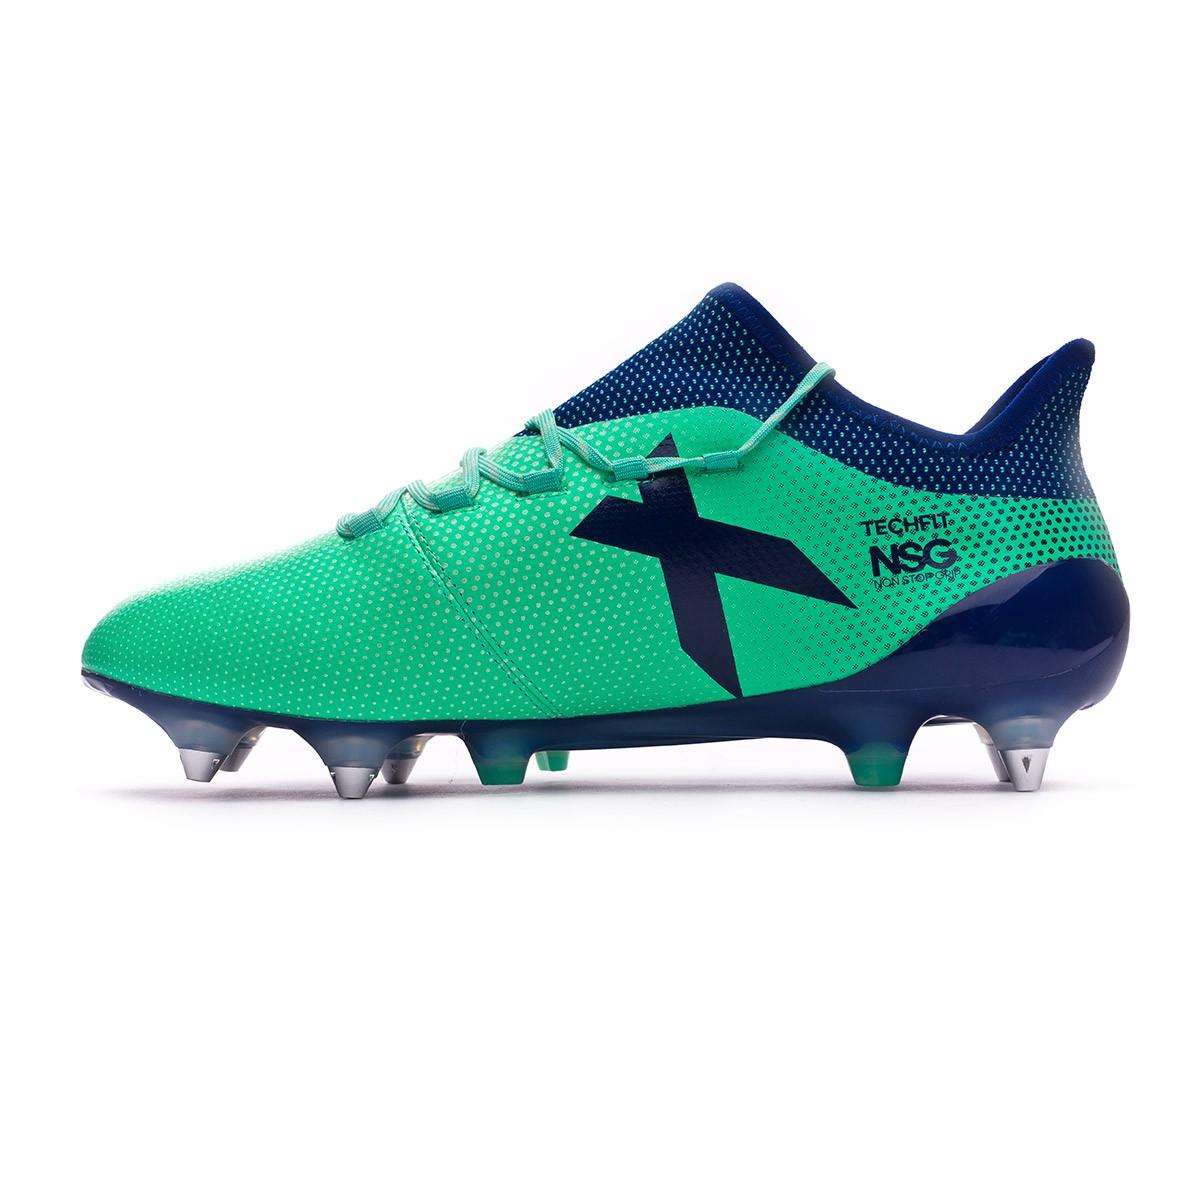 ... Bota X 17.1 SG Aero green-Unity ink-Hi-res green. CATEGORY 74590a942ce8